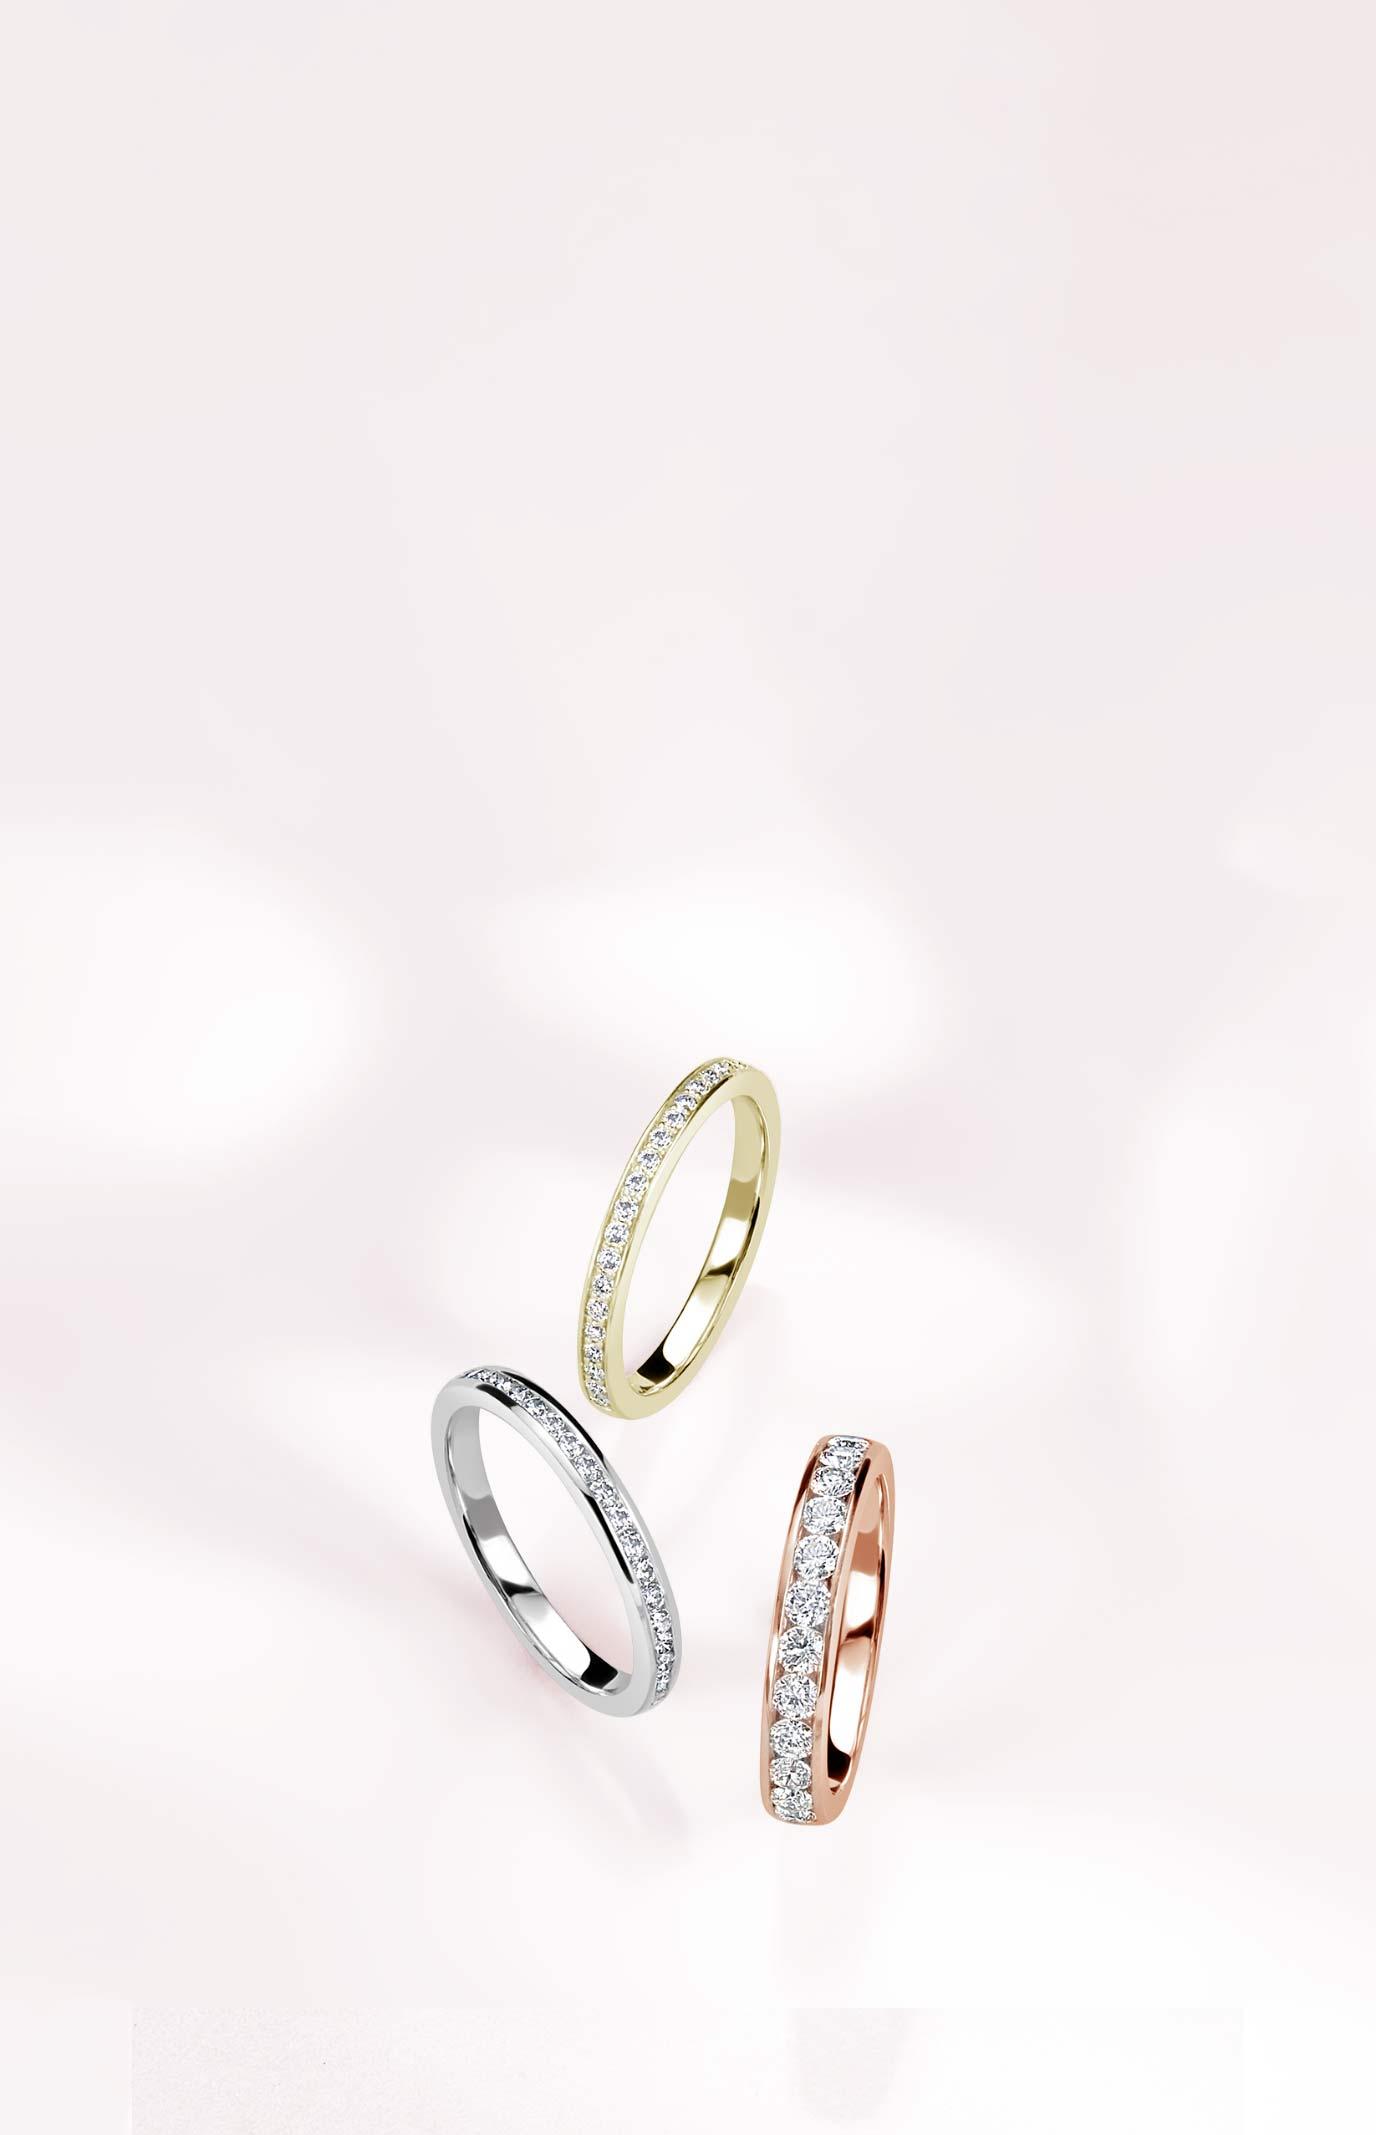 Ladies Diamond Wedding Rings - Steven Stone